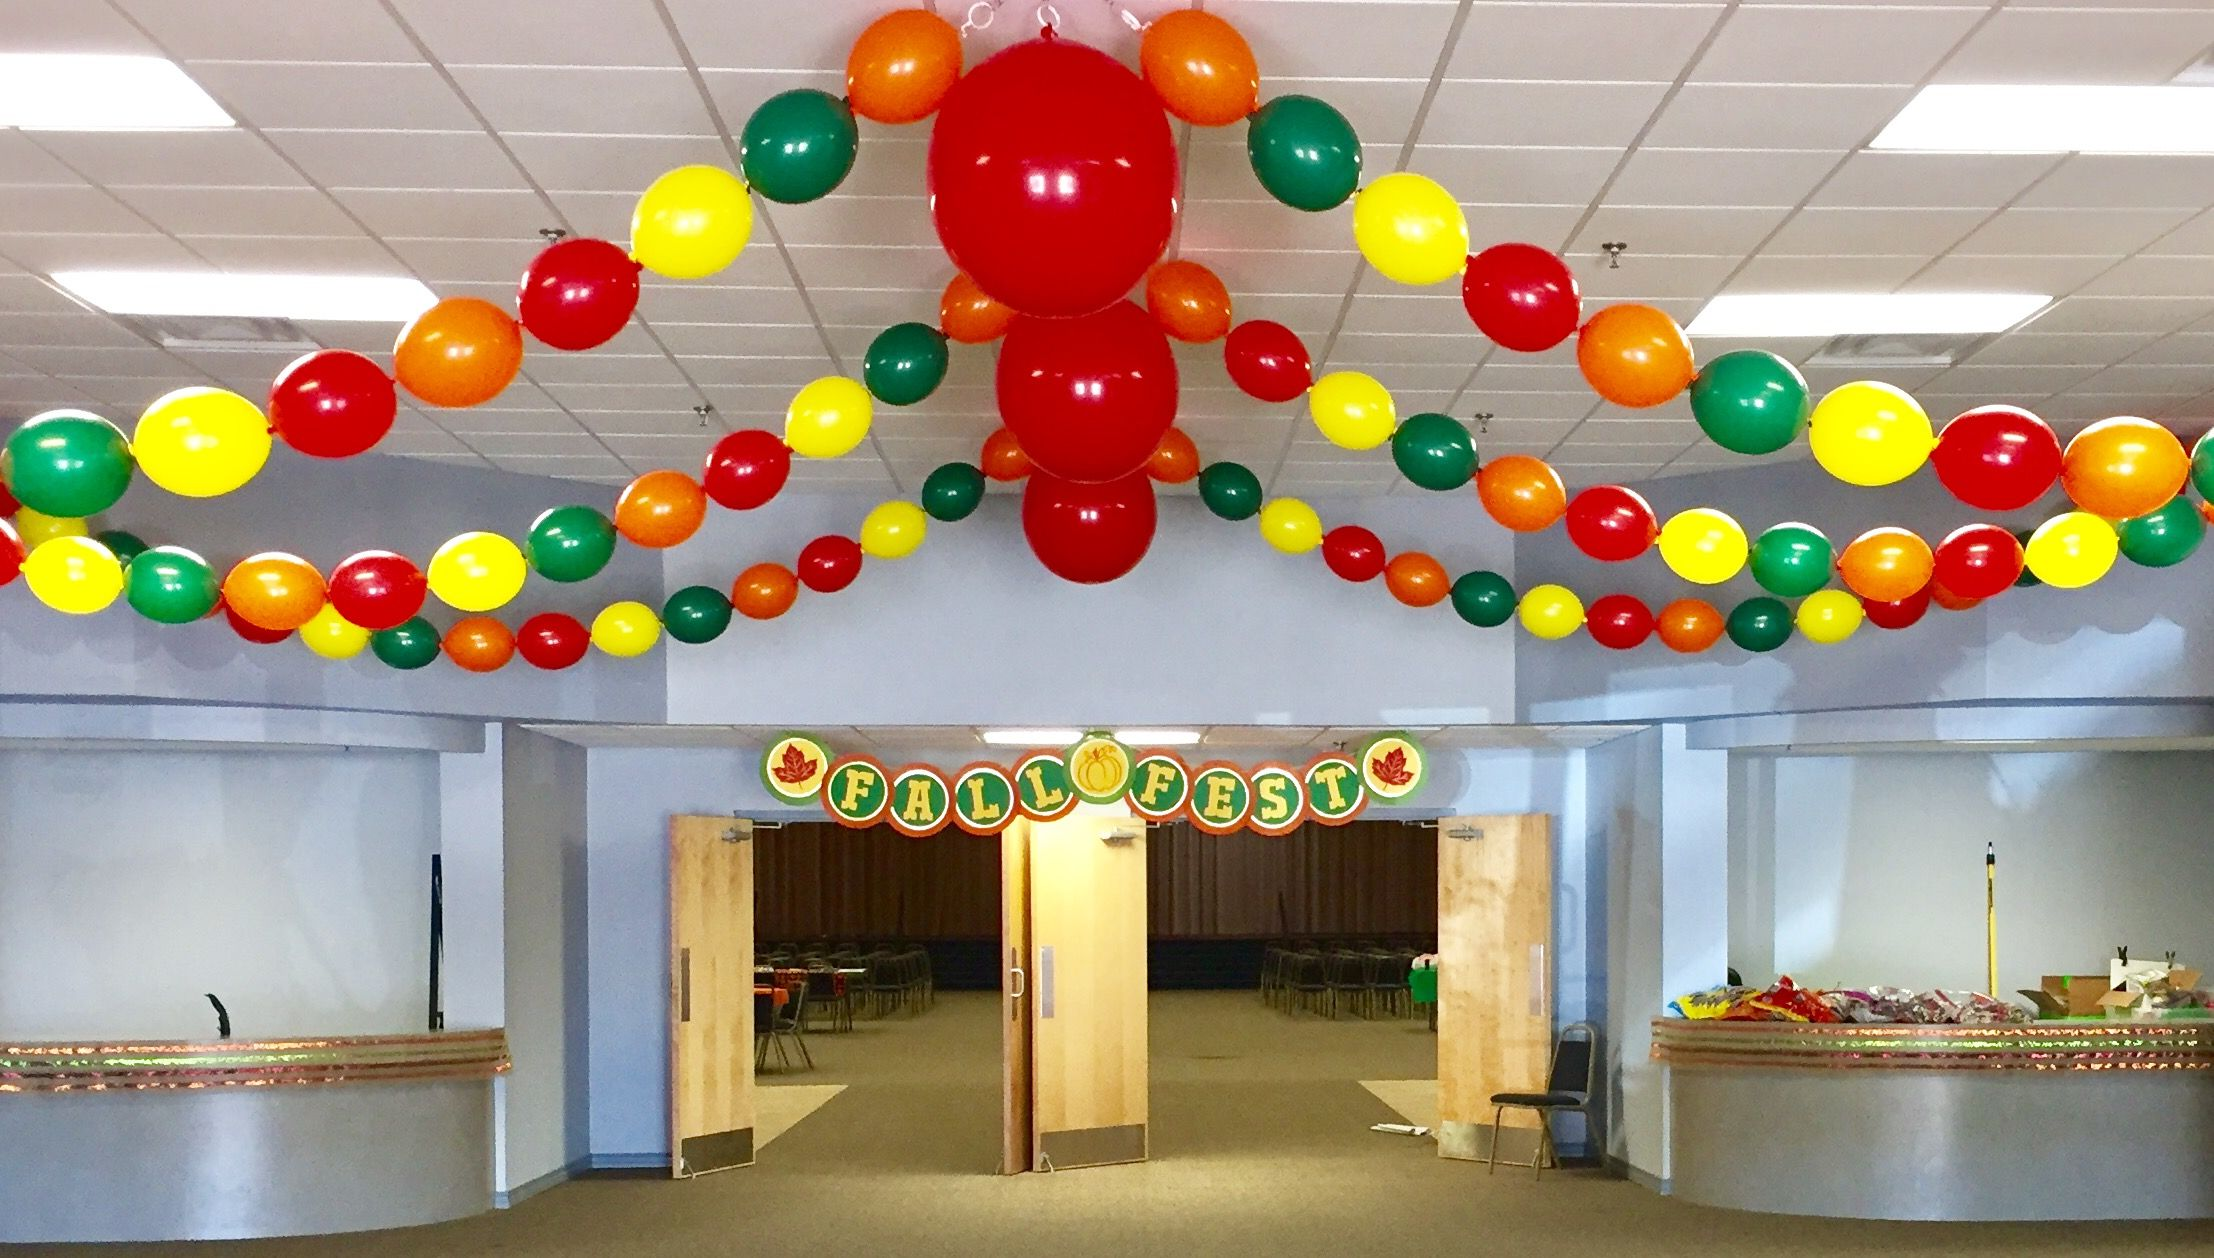 Fall / Harvest Festival Balloon Ceiling Decor - A bright ...